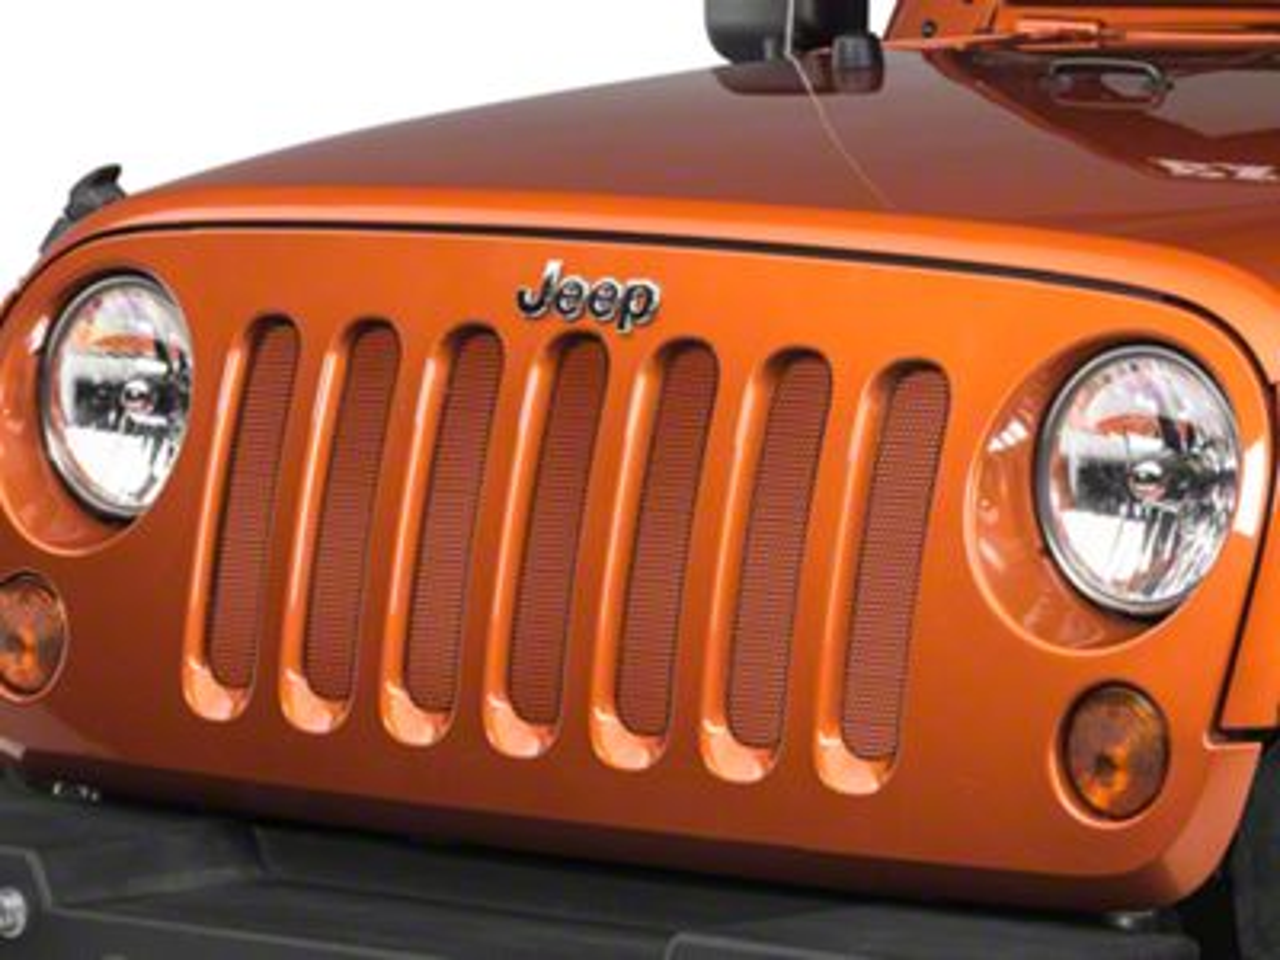 Under the Sun Grille Insert - Sunburst Orange Pearl (07-18 Jeep Wrangler JK)